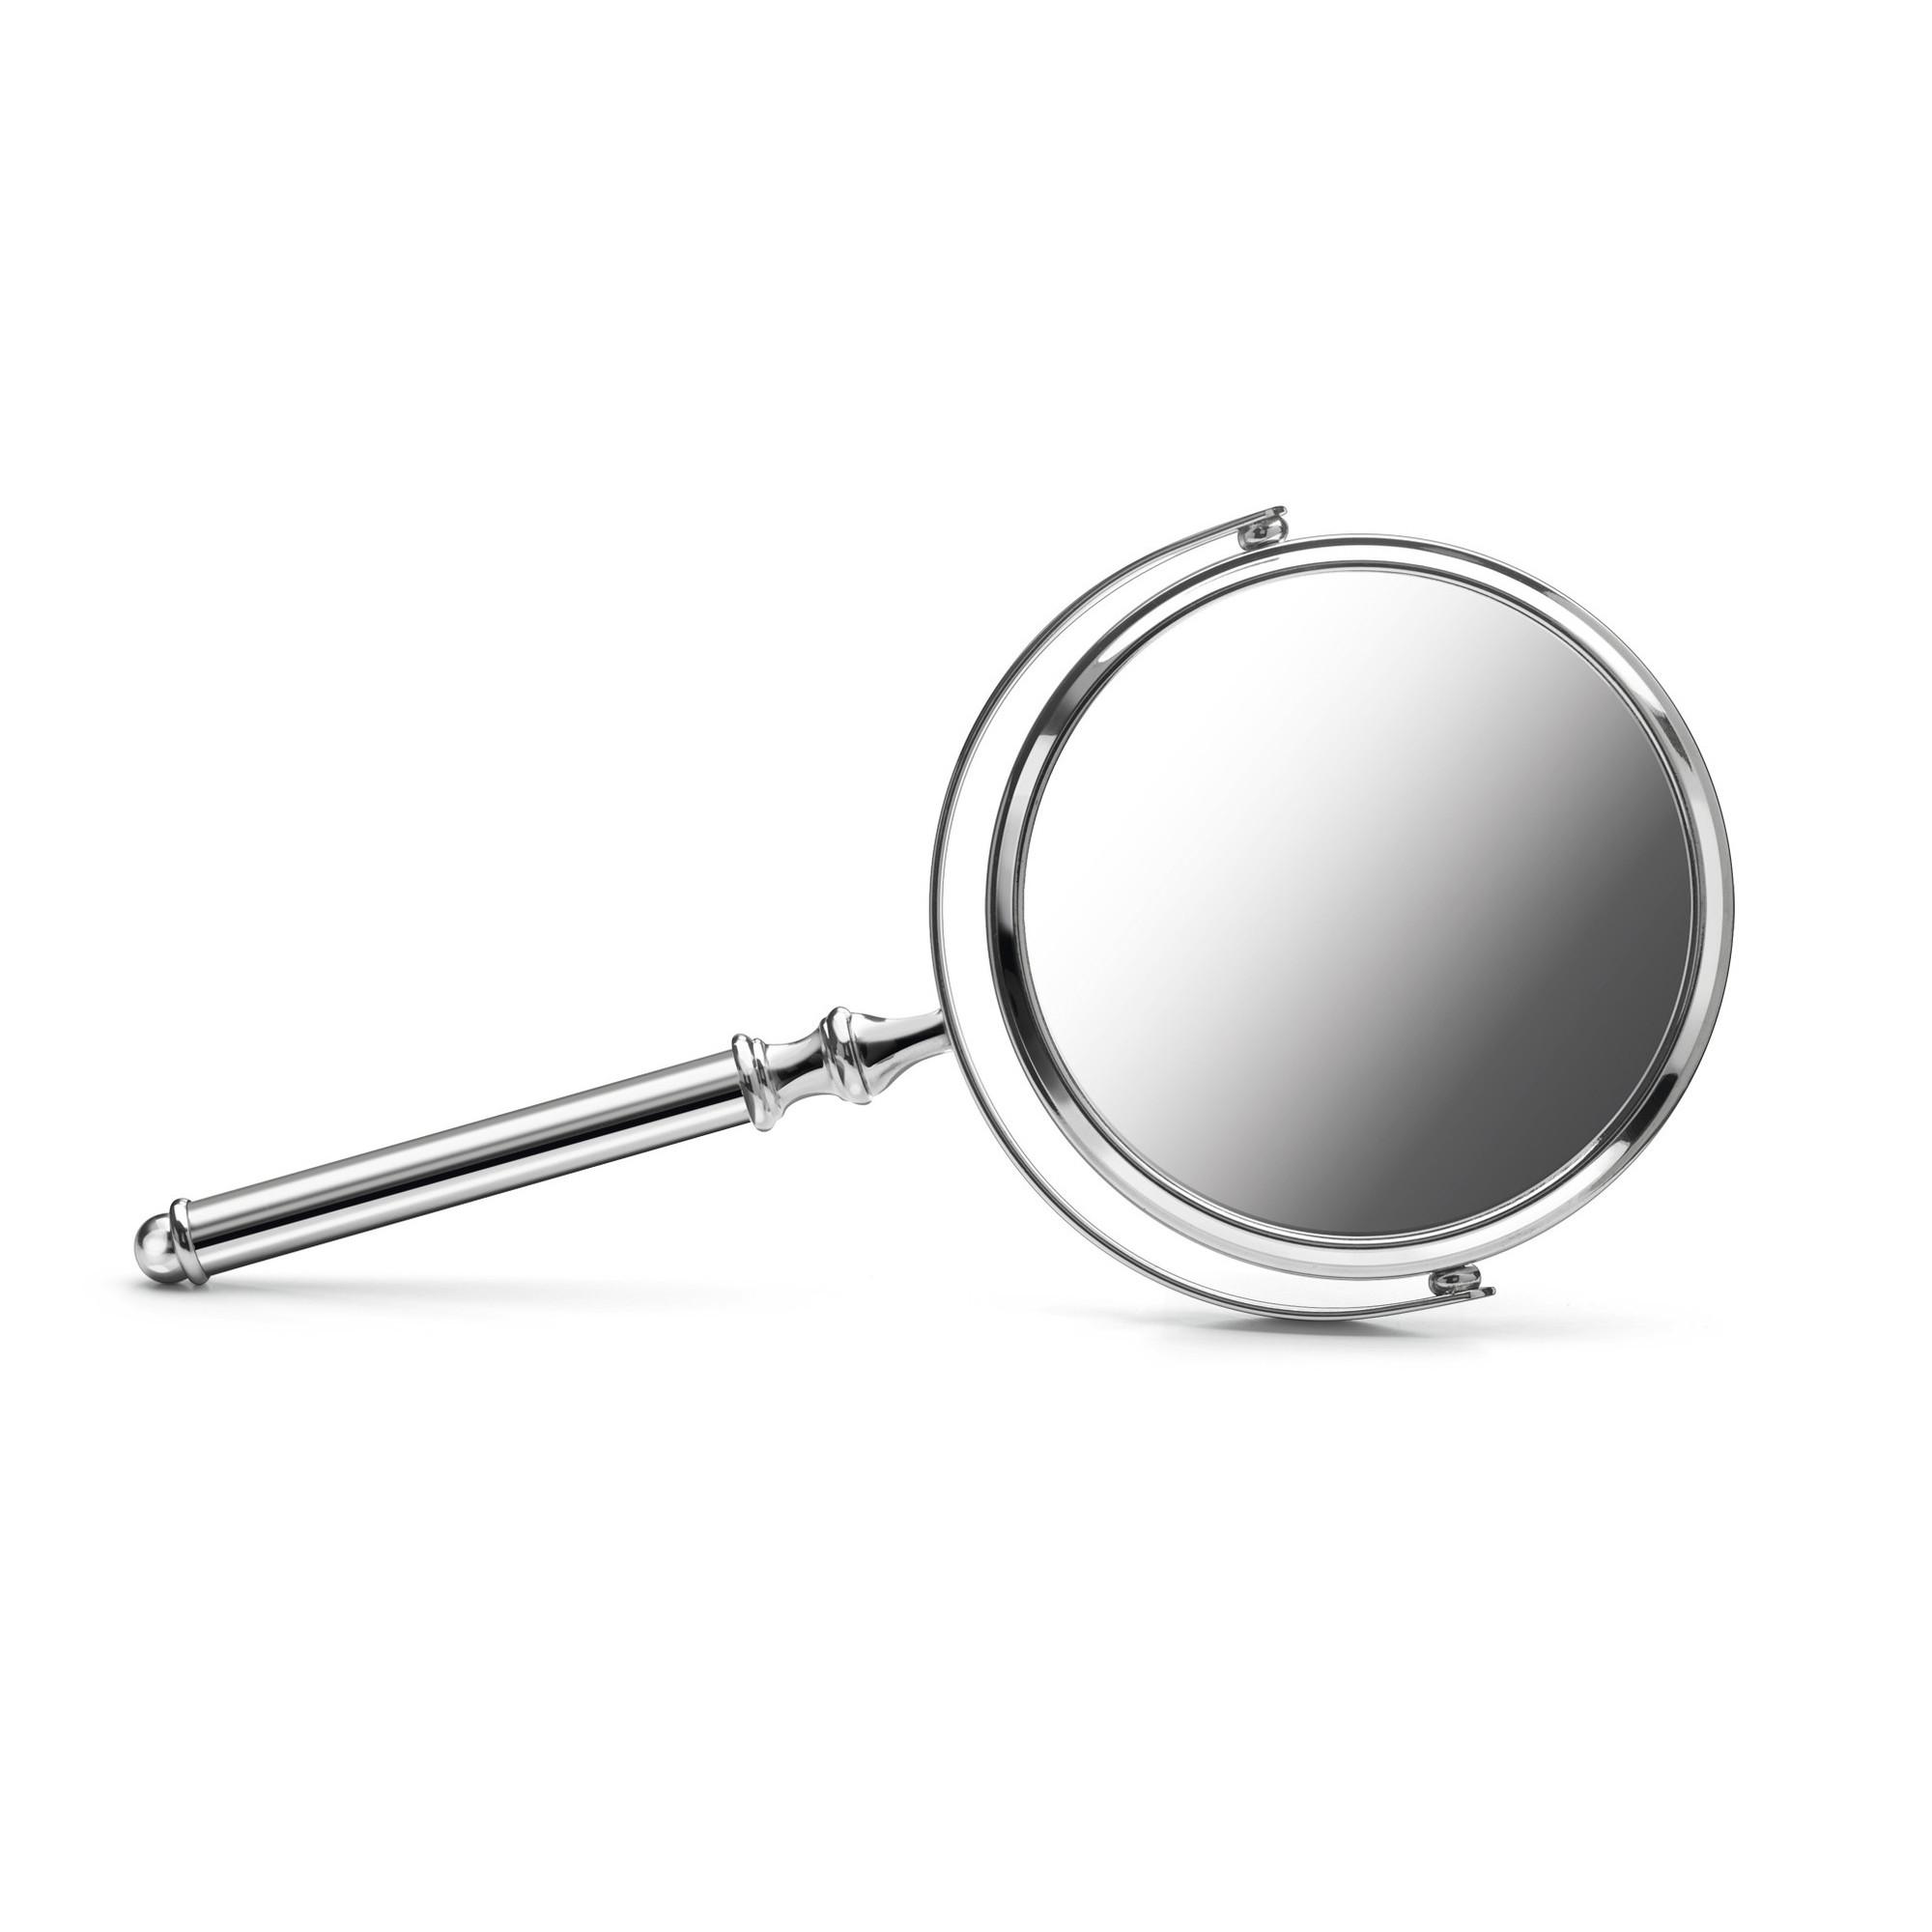 Miroir 23 - Acrylique - Agrandissement 10x - Ruck